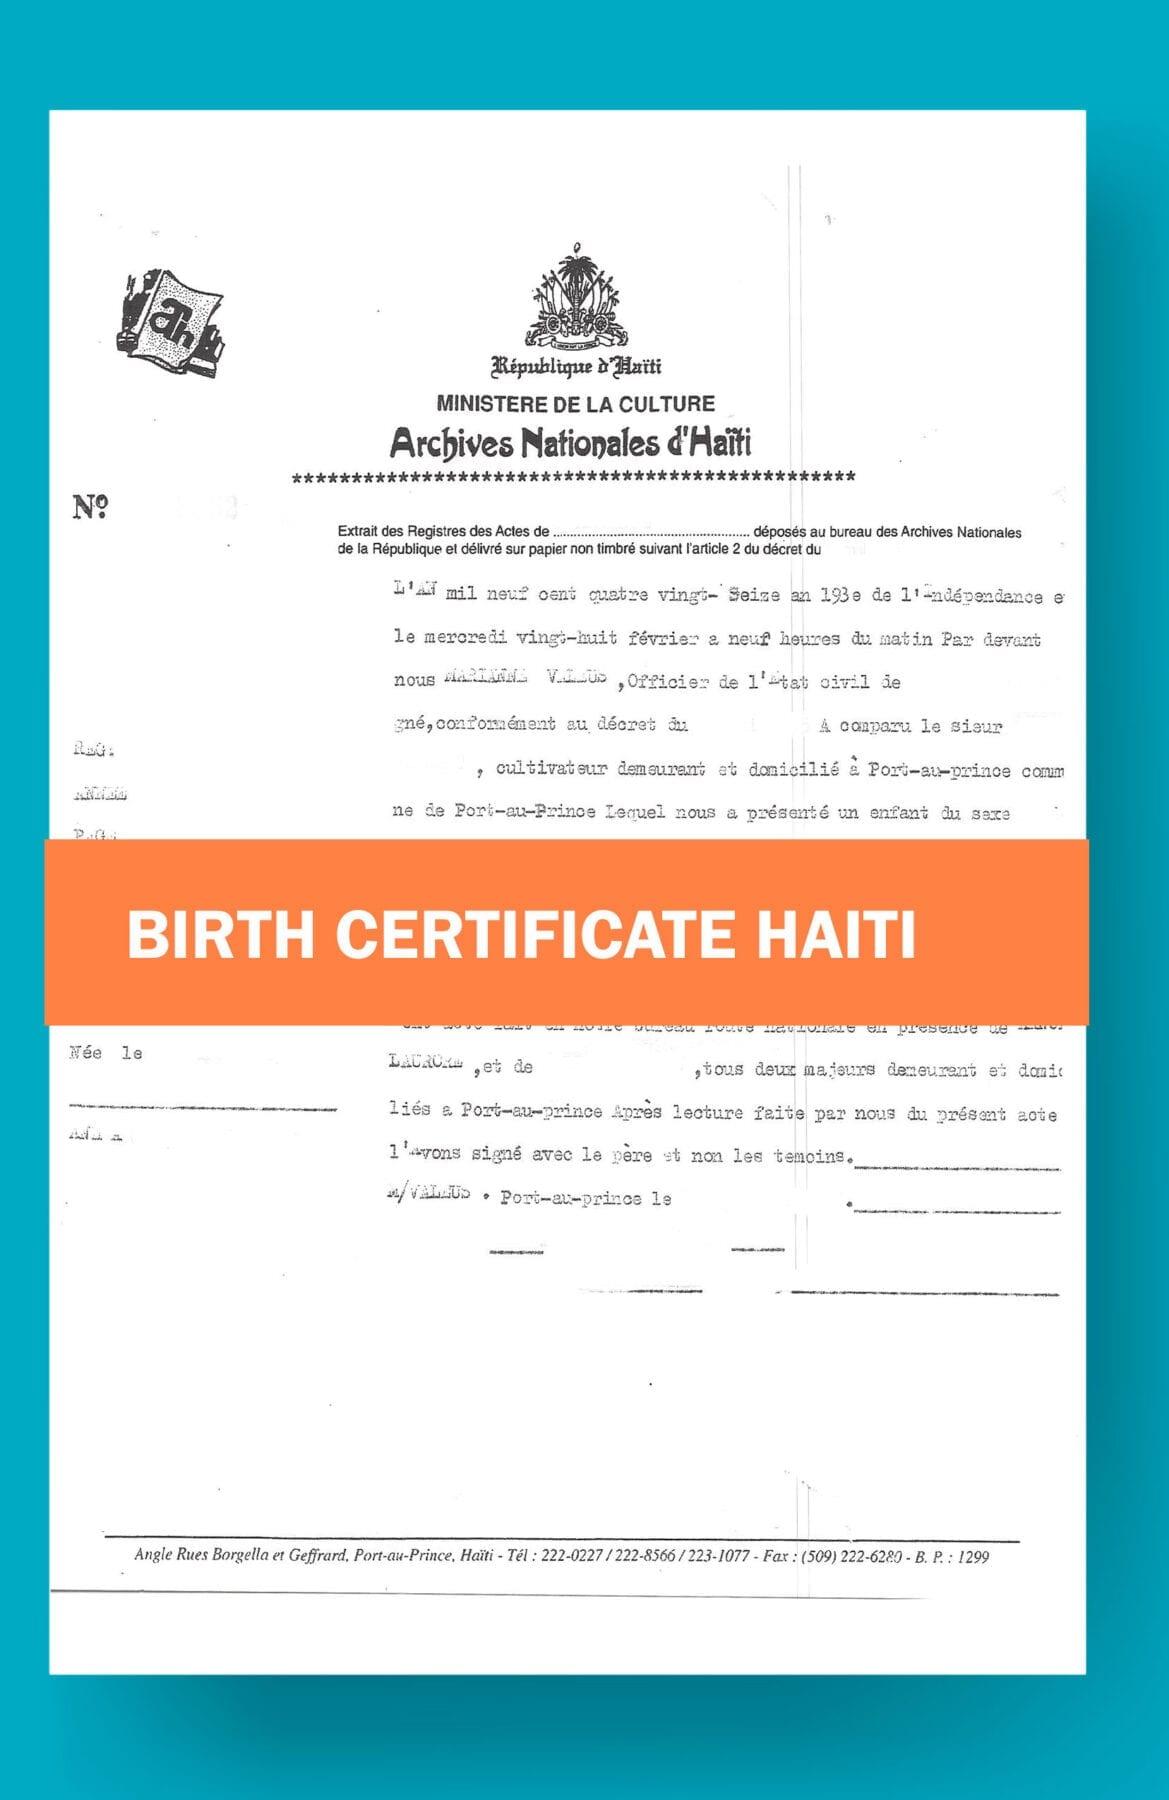 BIRTH-CERTIFICATE-TEMPLATE-HAITI-EXAMPLE-2